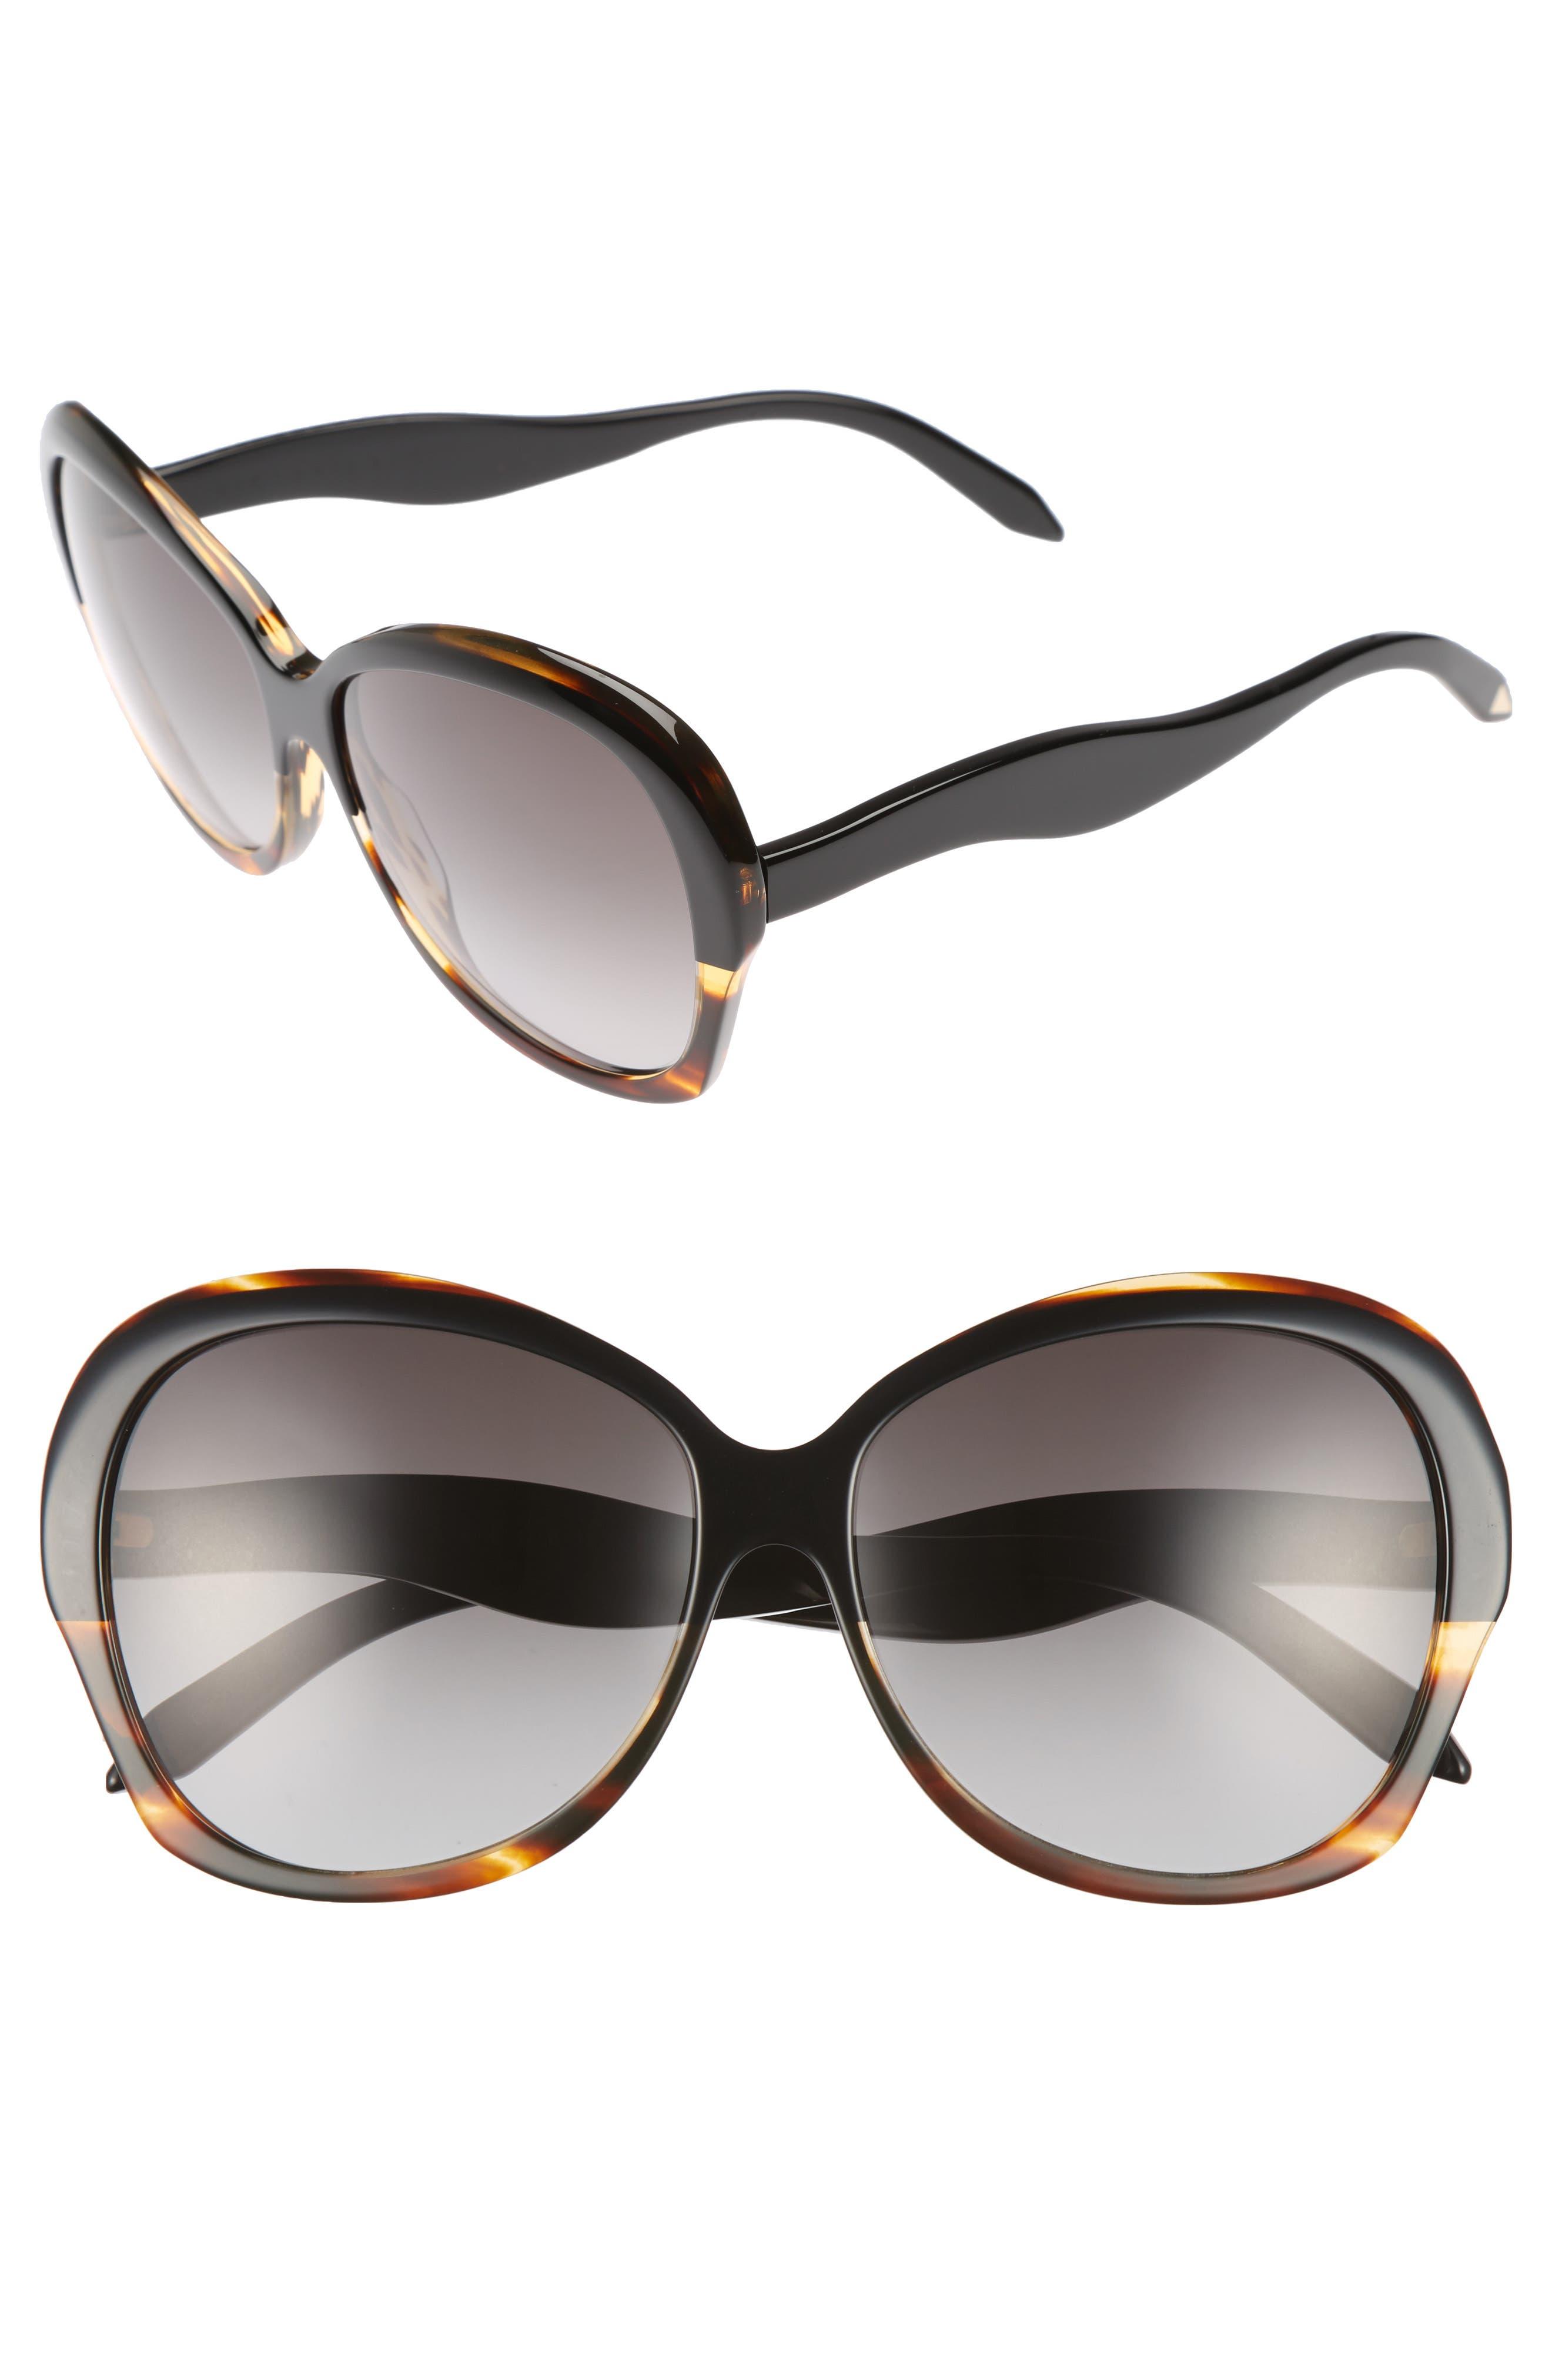 58cebab53 Buy victoria beckham sunglasses & eyewear for women - Best women's victoria  beckham sunglasses & eyewear shop - Cools.com